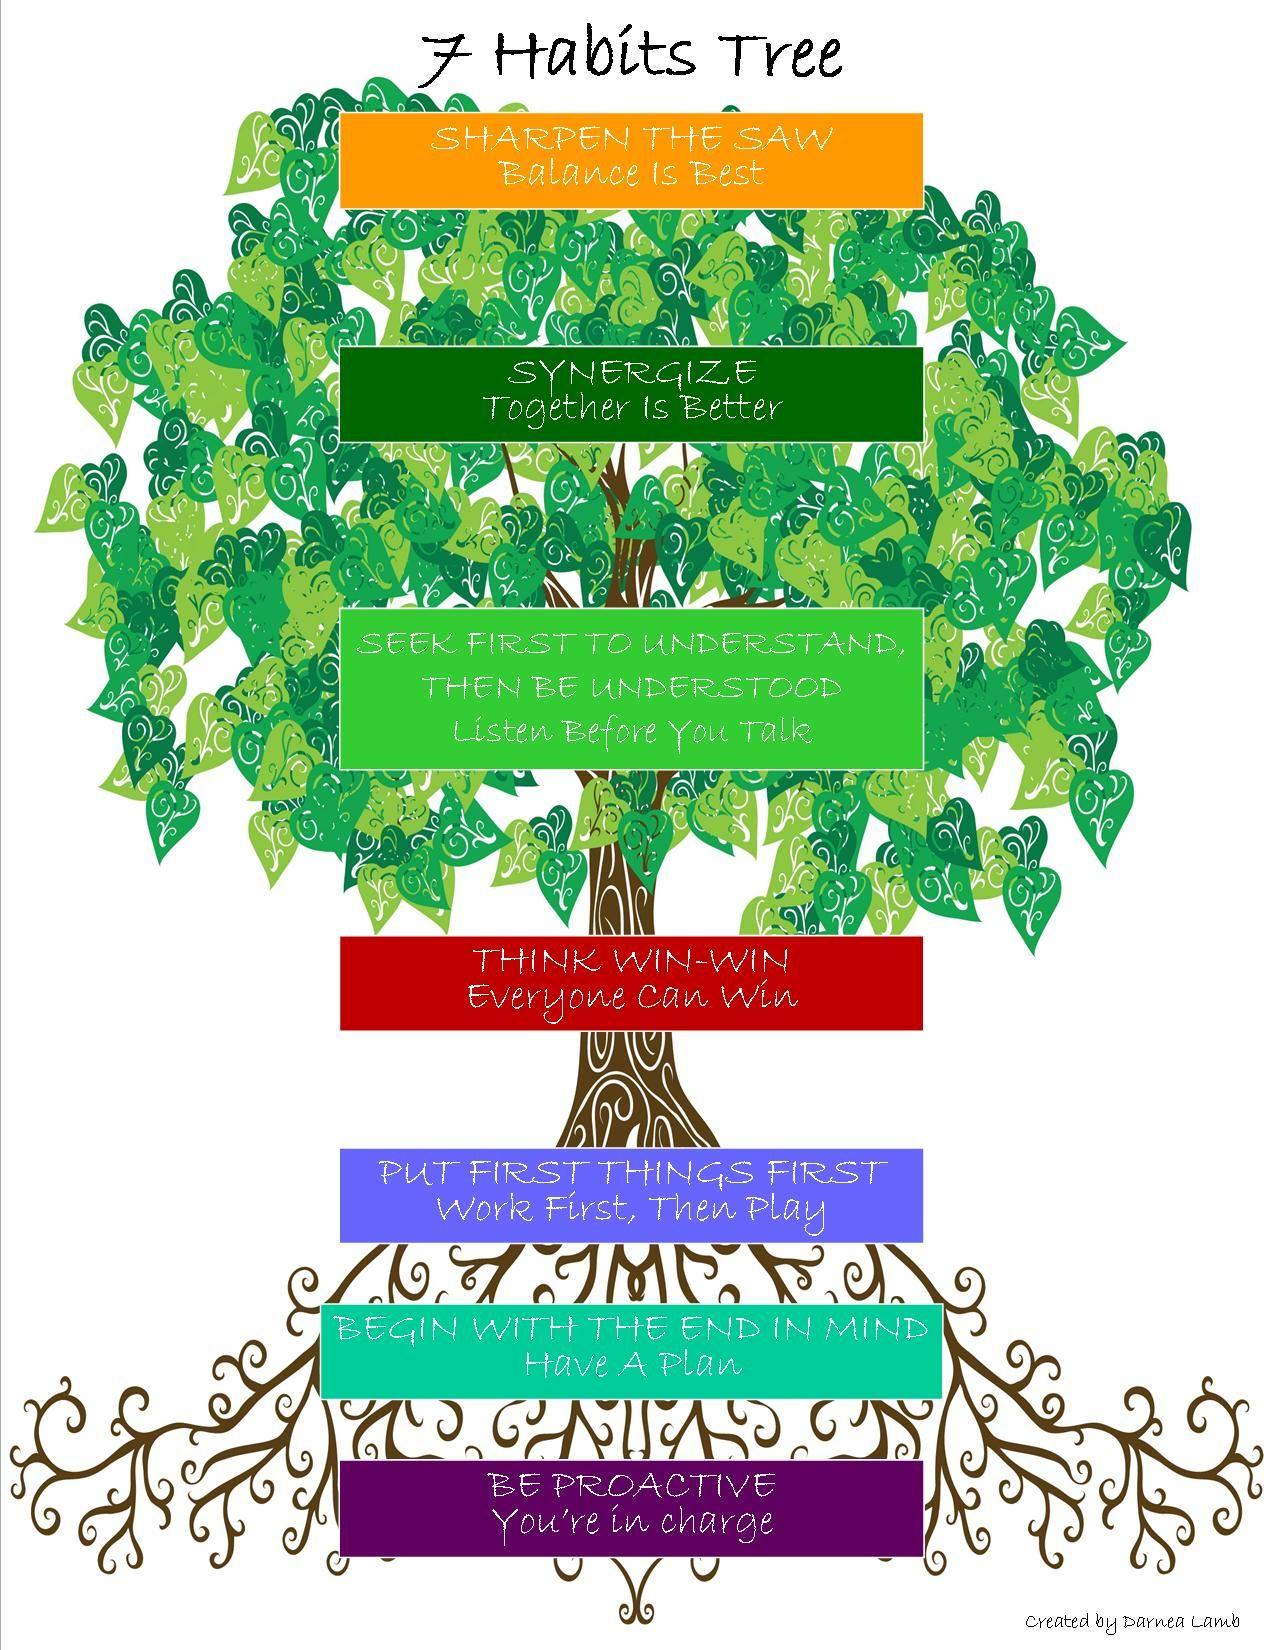 7 Habits Tree Poster   Worksheets for kids [ 1650 x 1275 Pixel ]